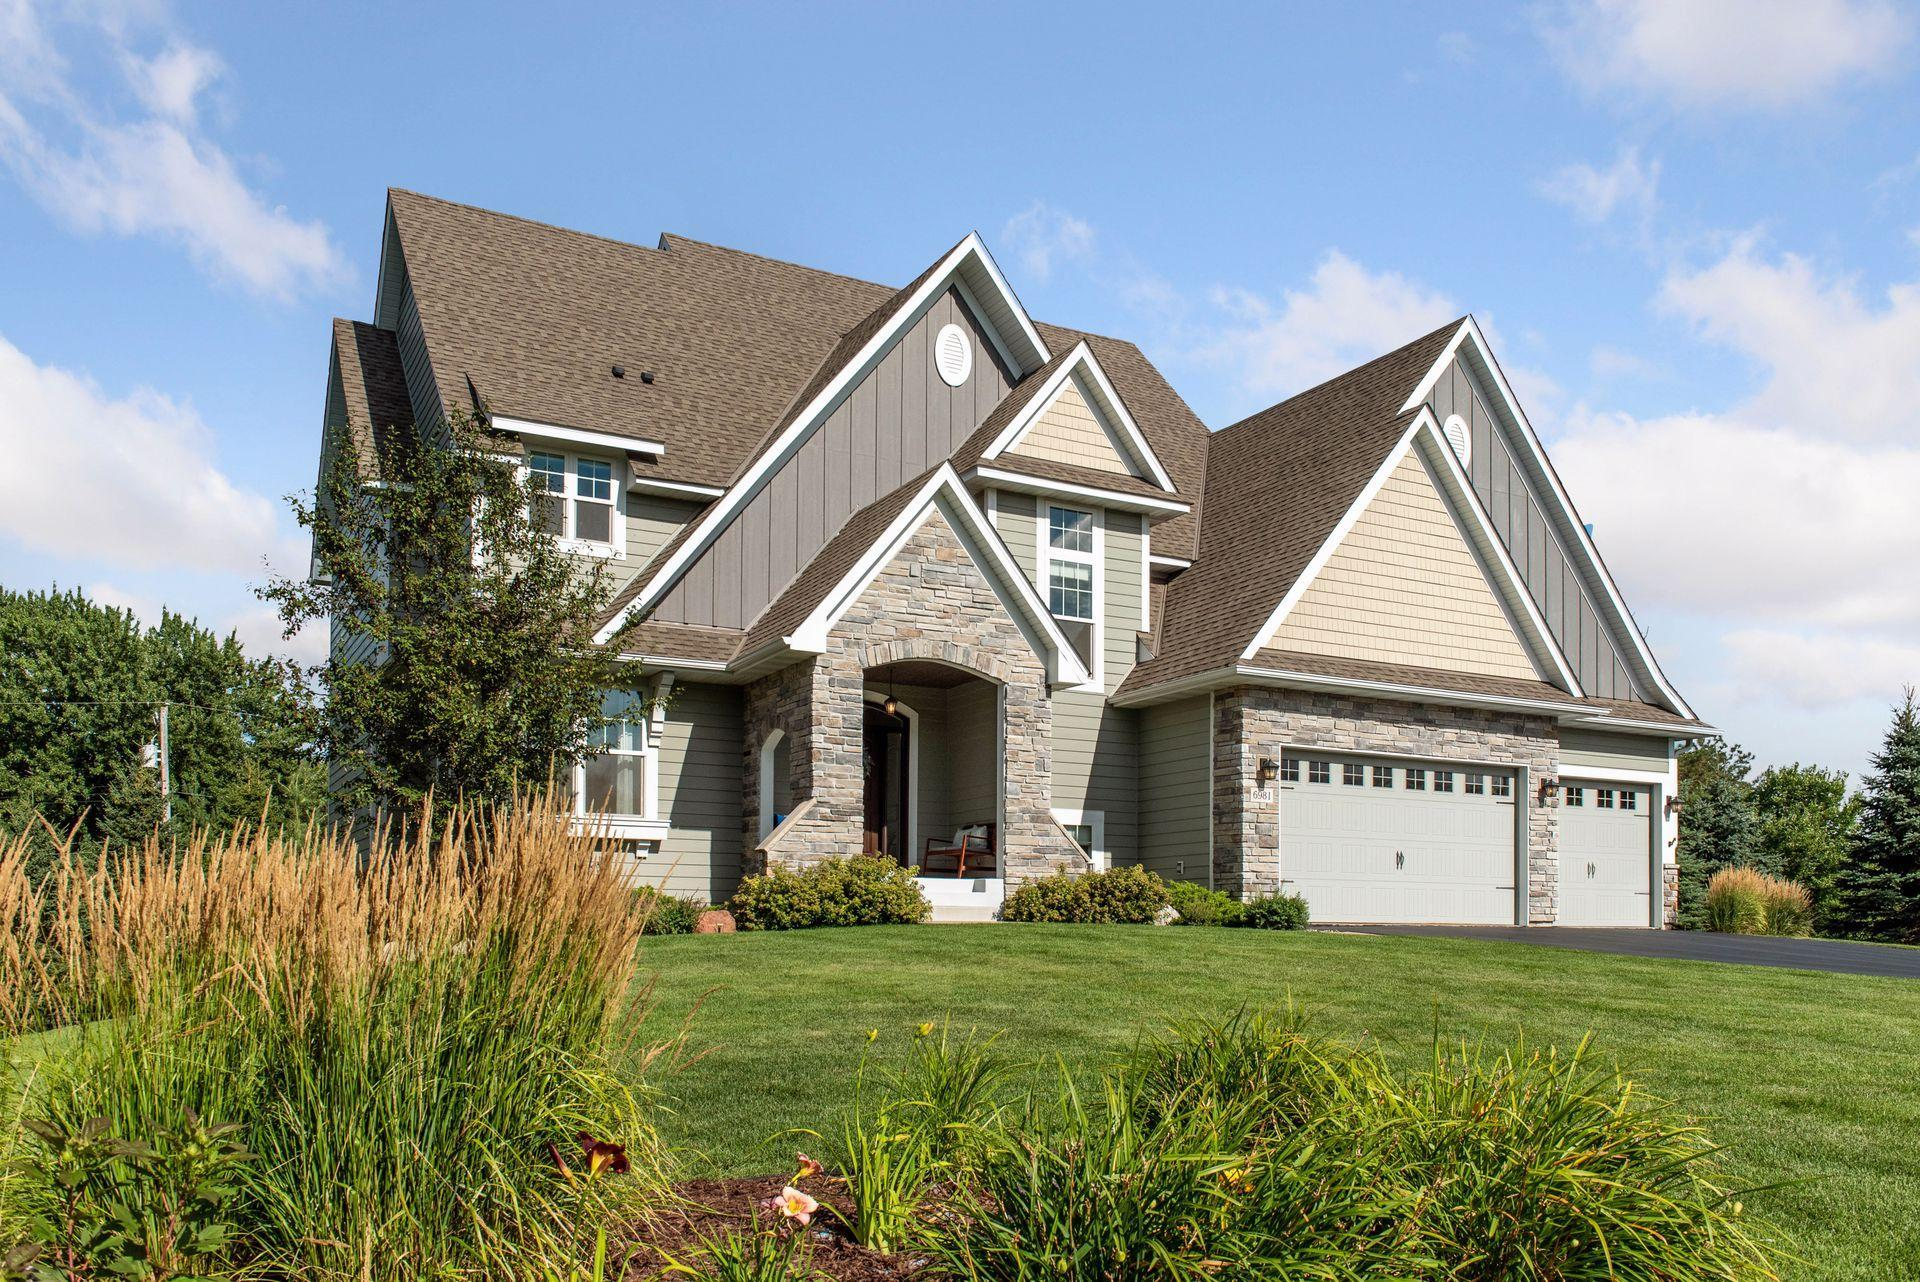 6981 W 175th Avenue Property Photo - Eden Prairie, MN real estate listing